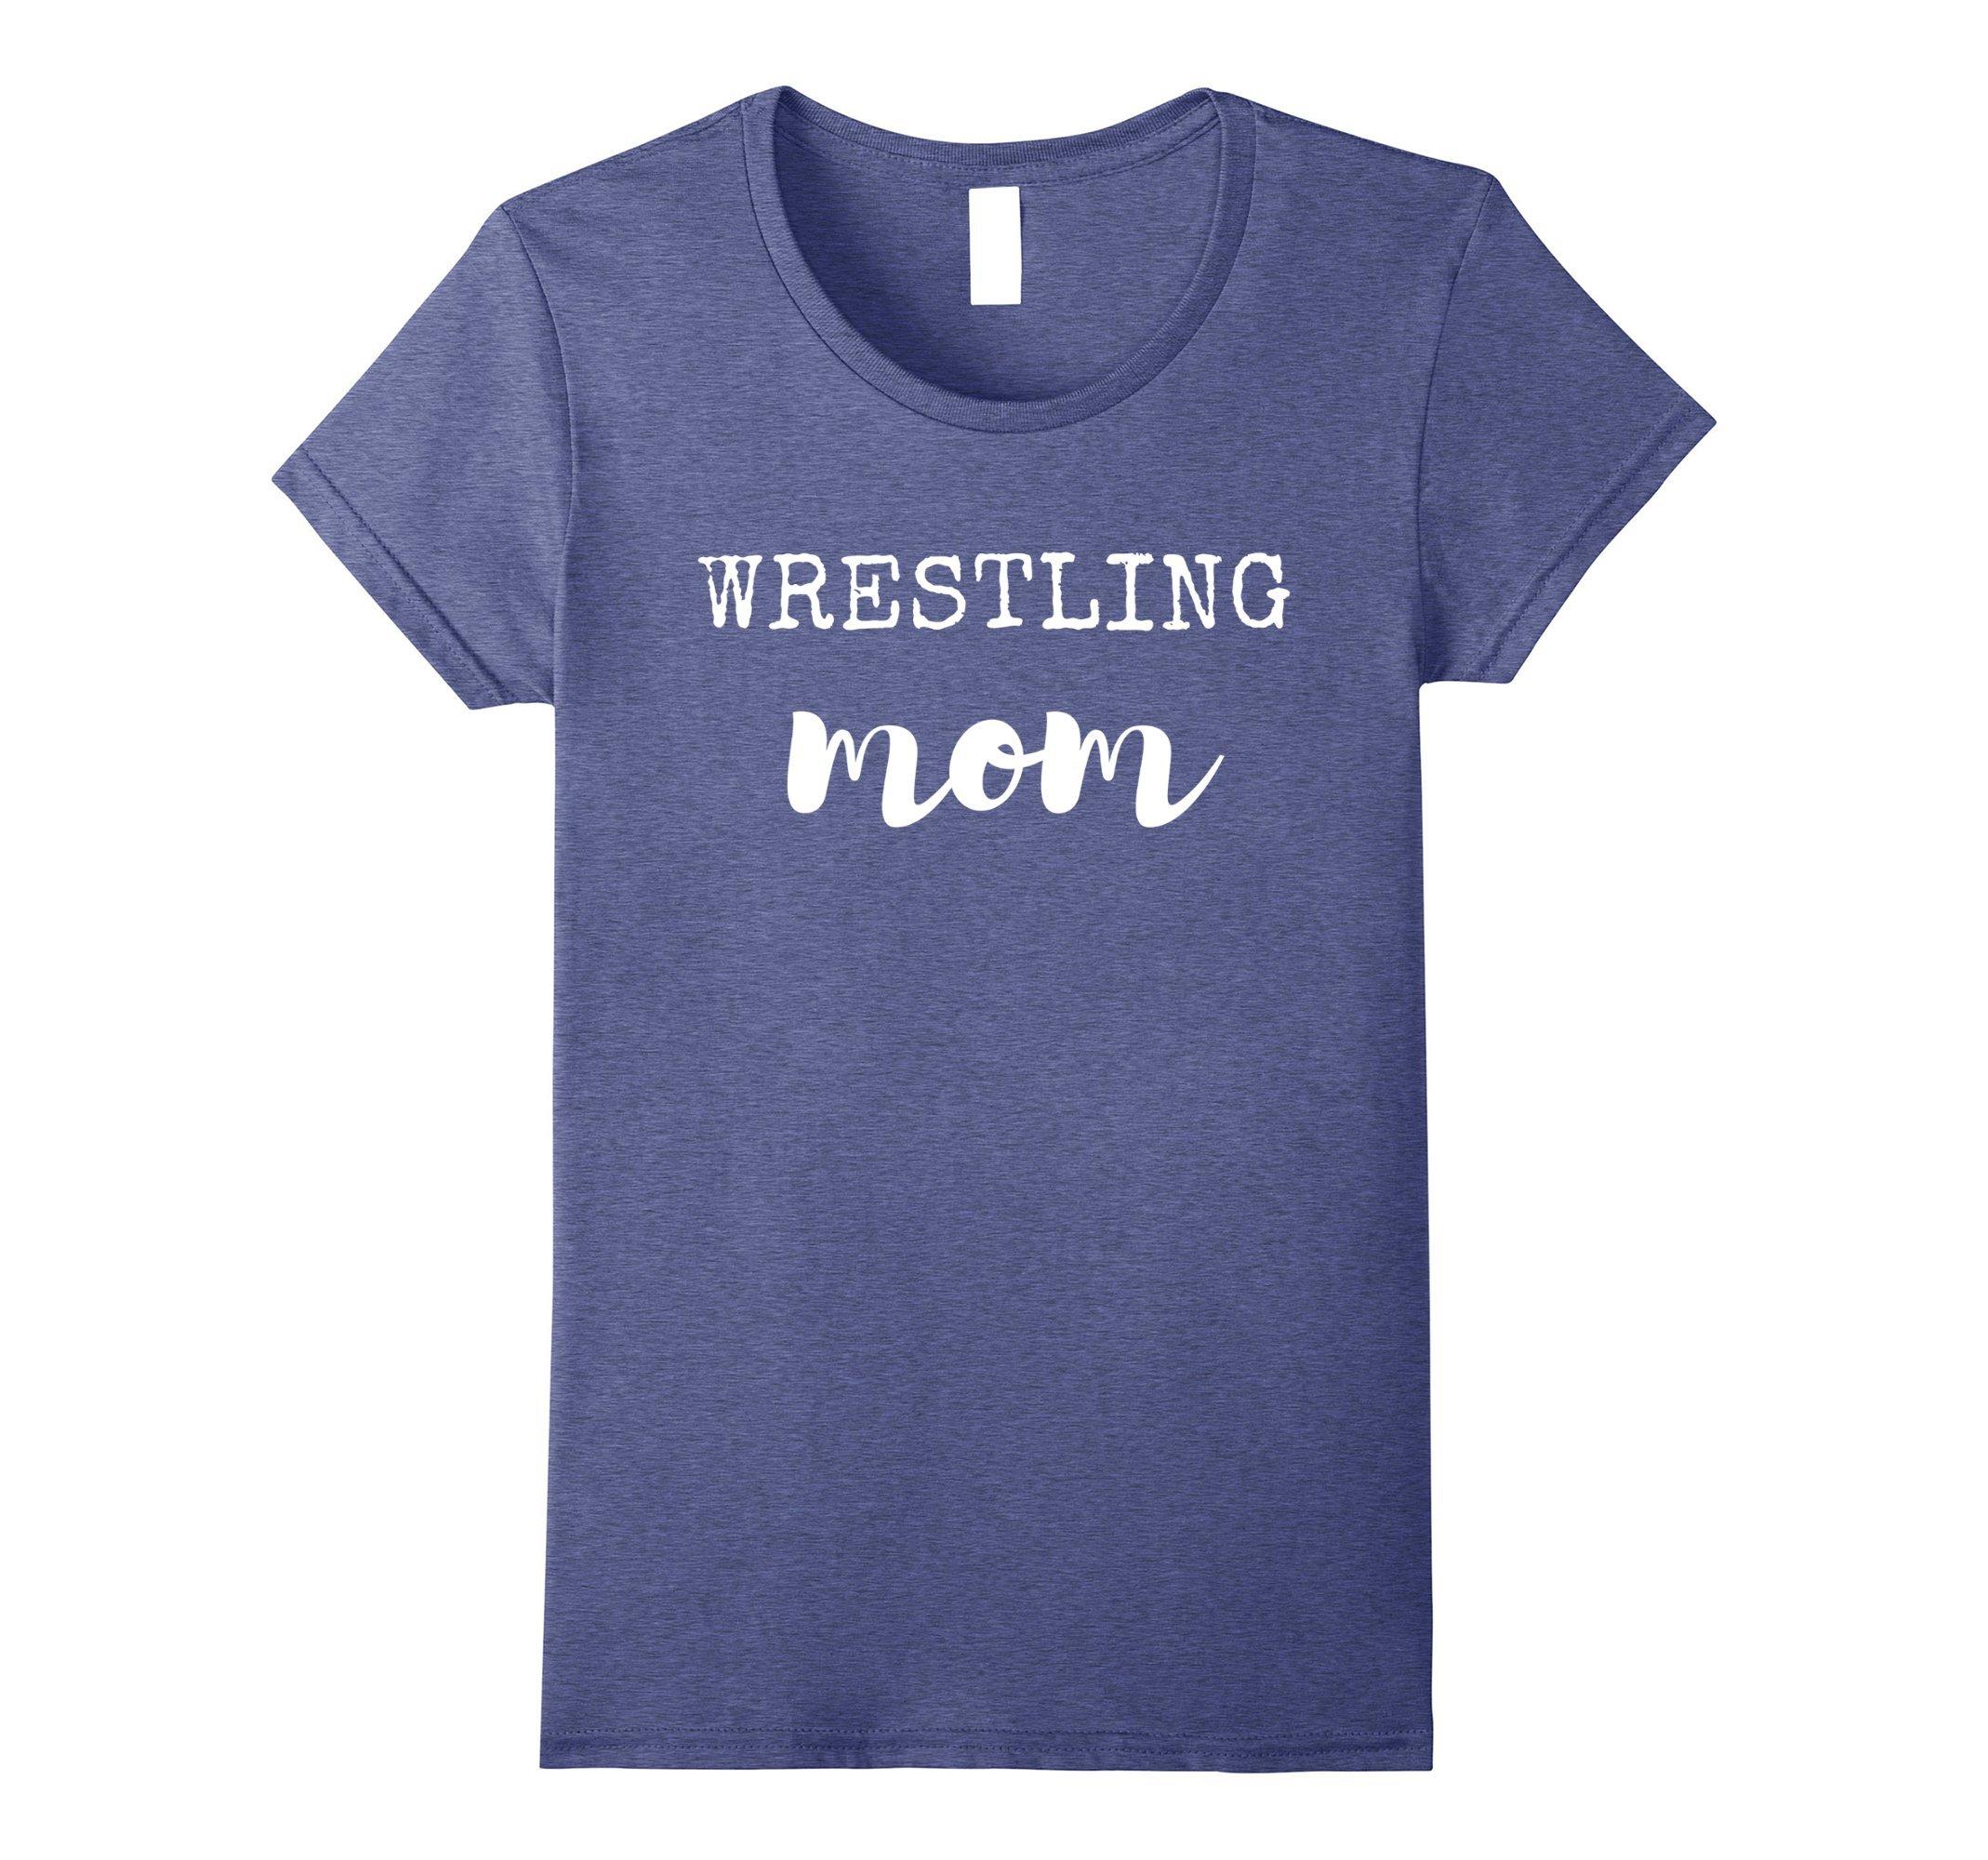 Womens Wrestling Mom T-Shirt for Women Medium Heather Blue